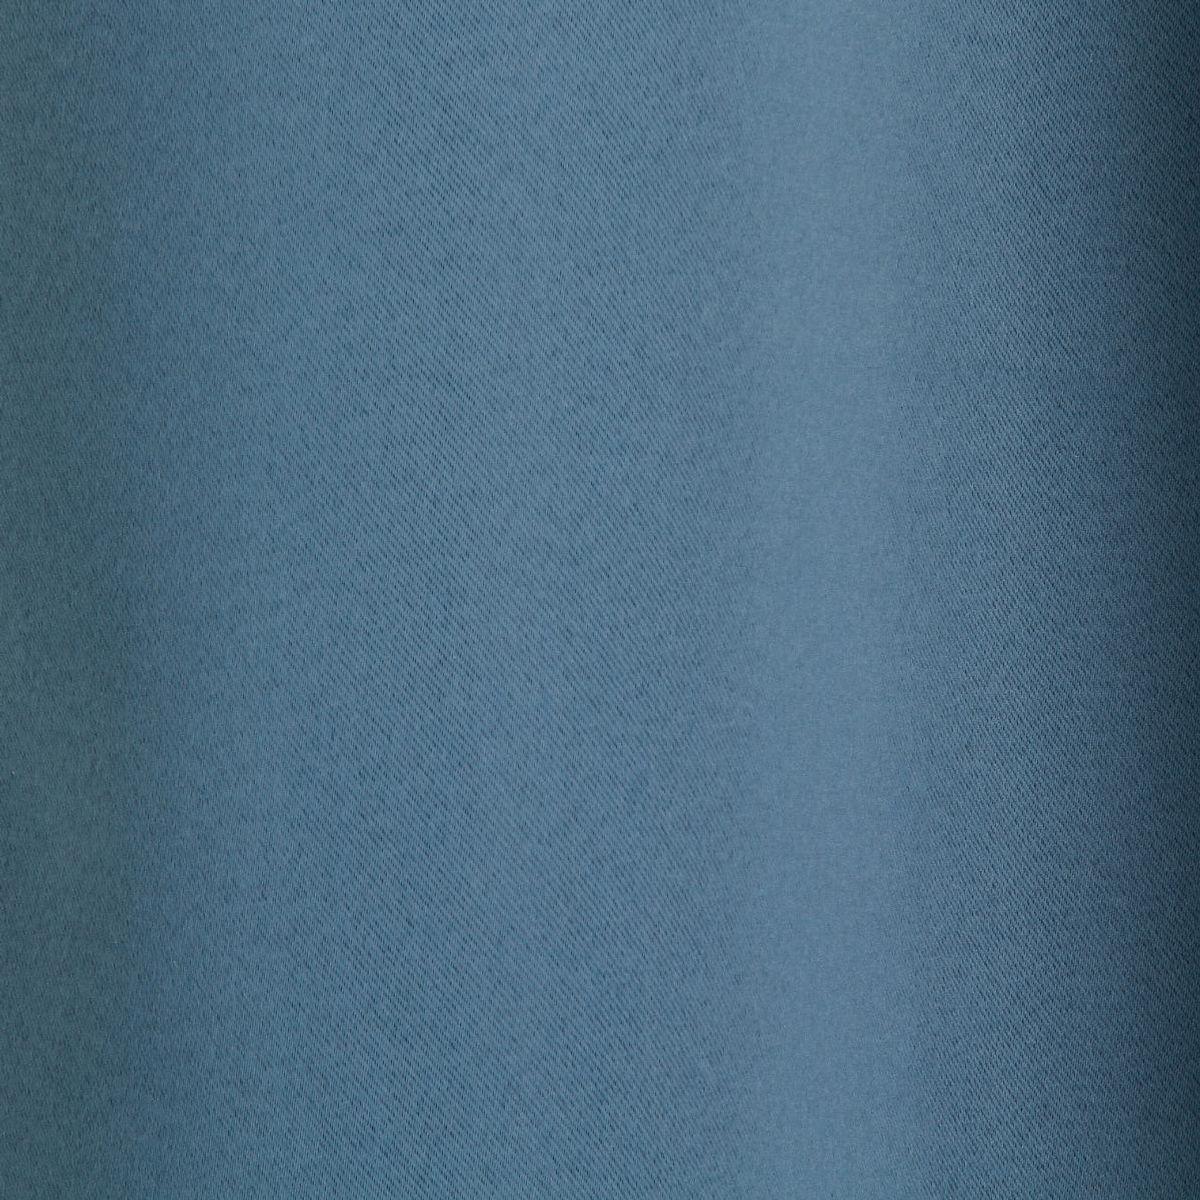 Rideau occultant bleu orage Toledad 140x260 cm